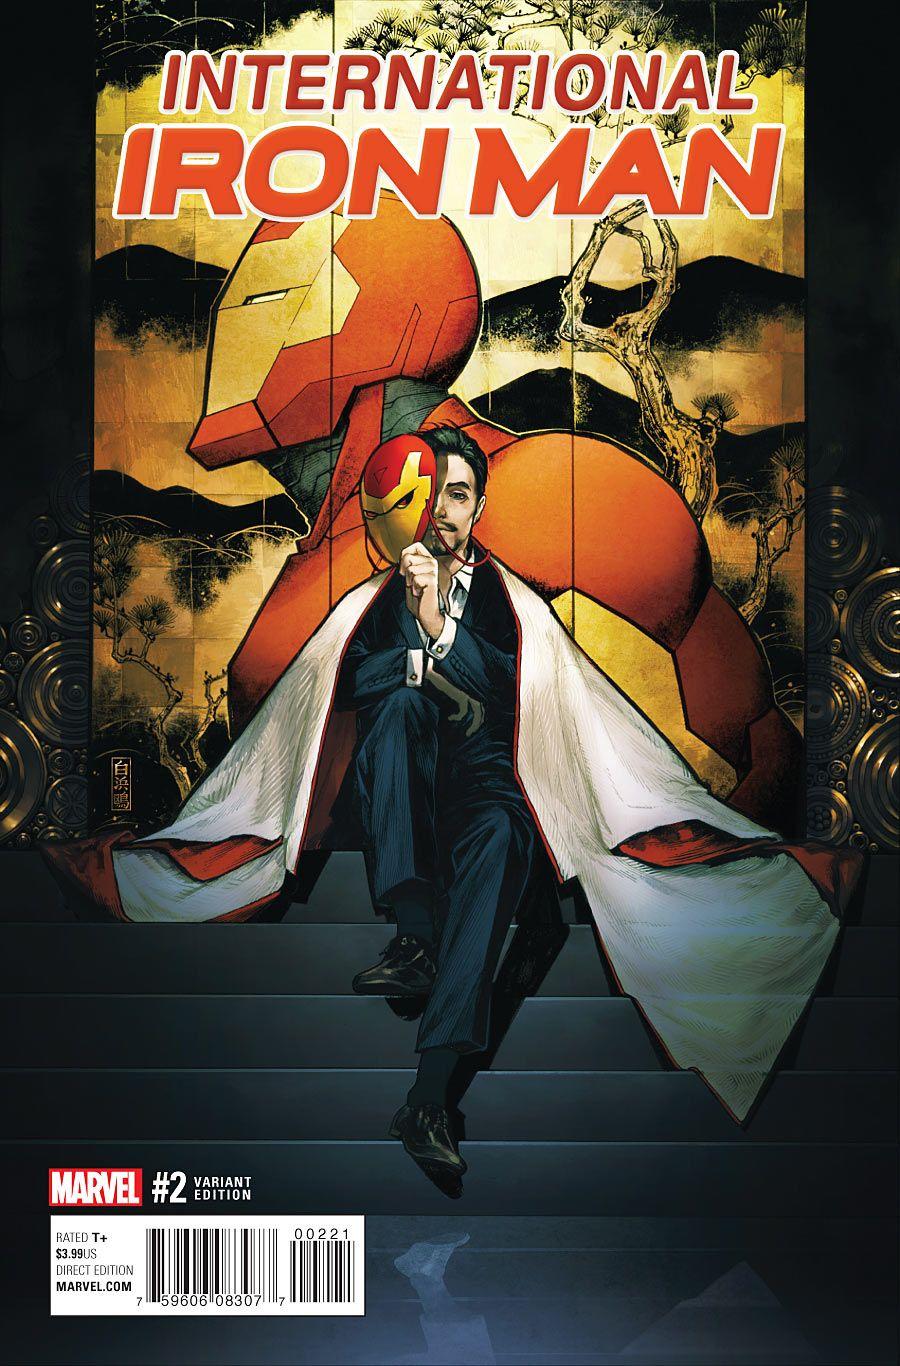 International Iron Man #2